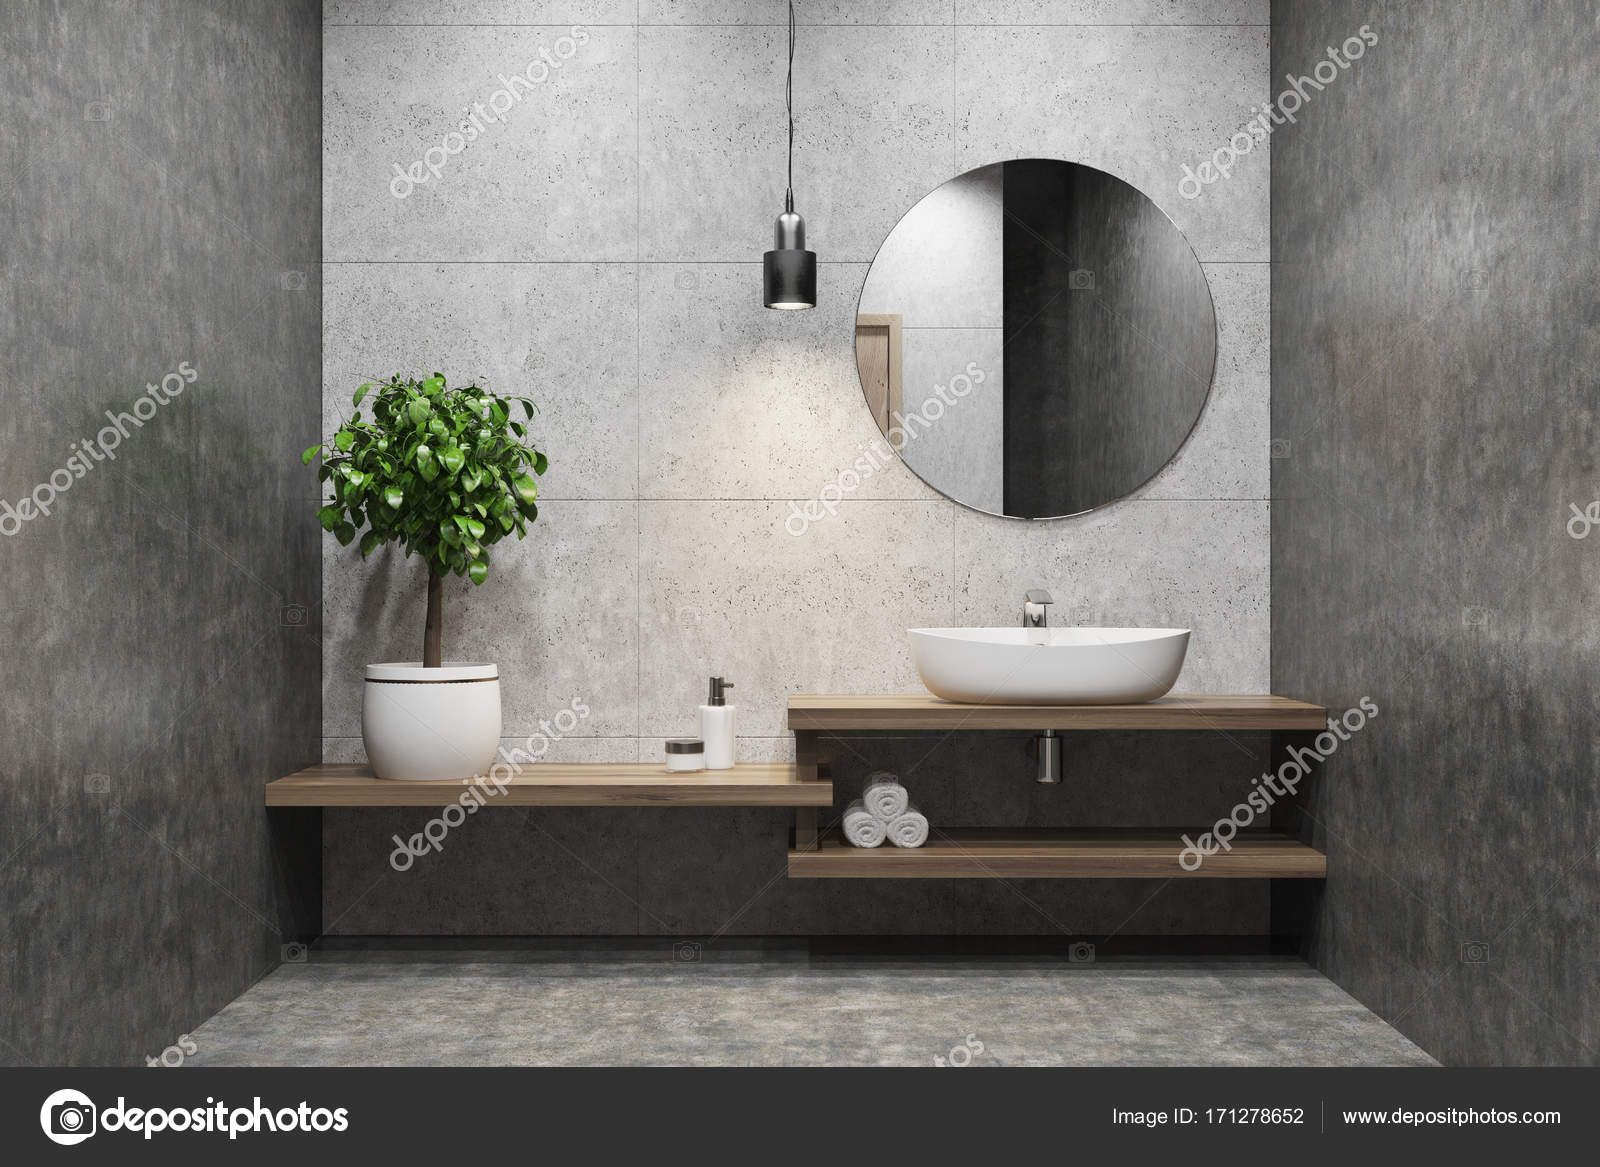 Betonnen wastafel badkamer ronde spiegel u stockfoto